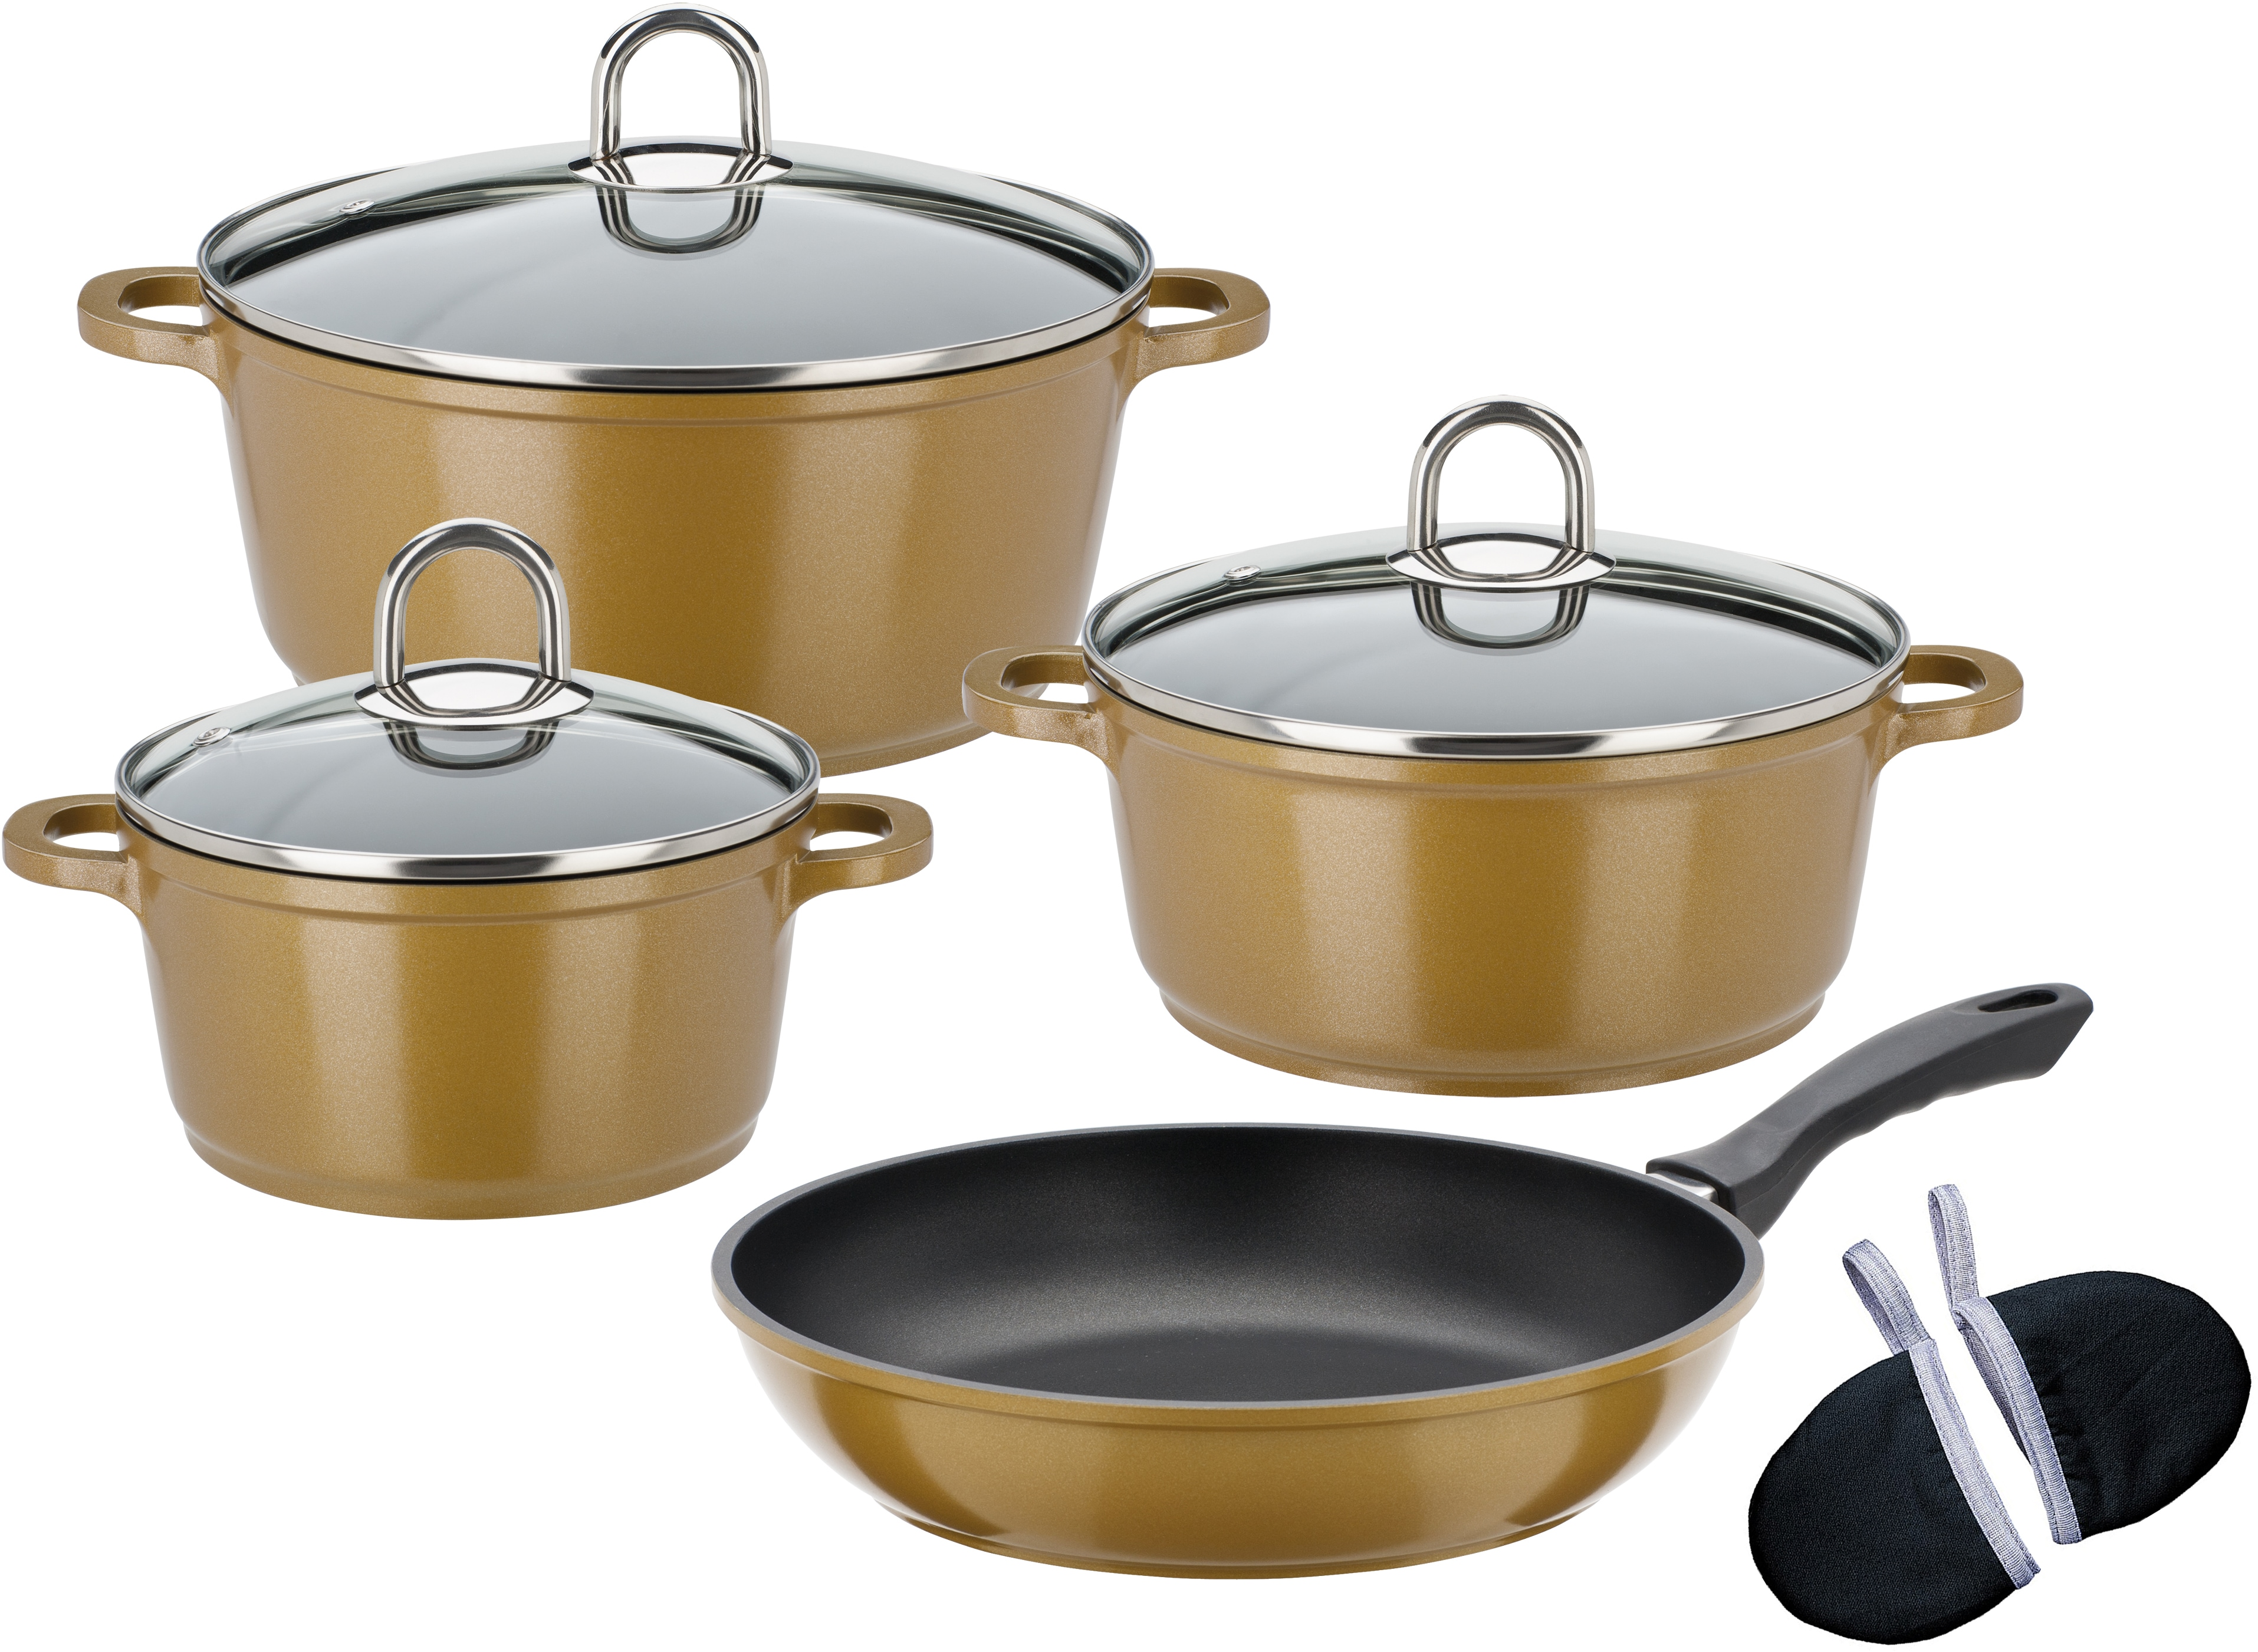 GSW Topf-Set Gourmet Premium Color (Set 9-tlg) Wohnen/Haushalt/Haushaltswaren/Töpfe/Topfsets